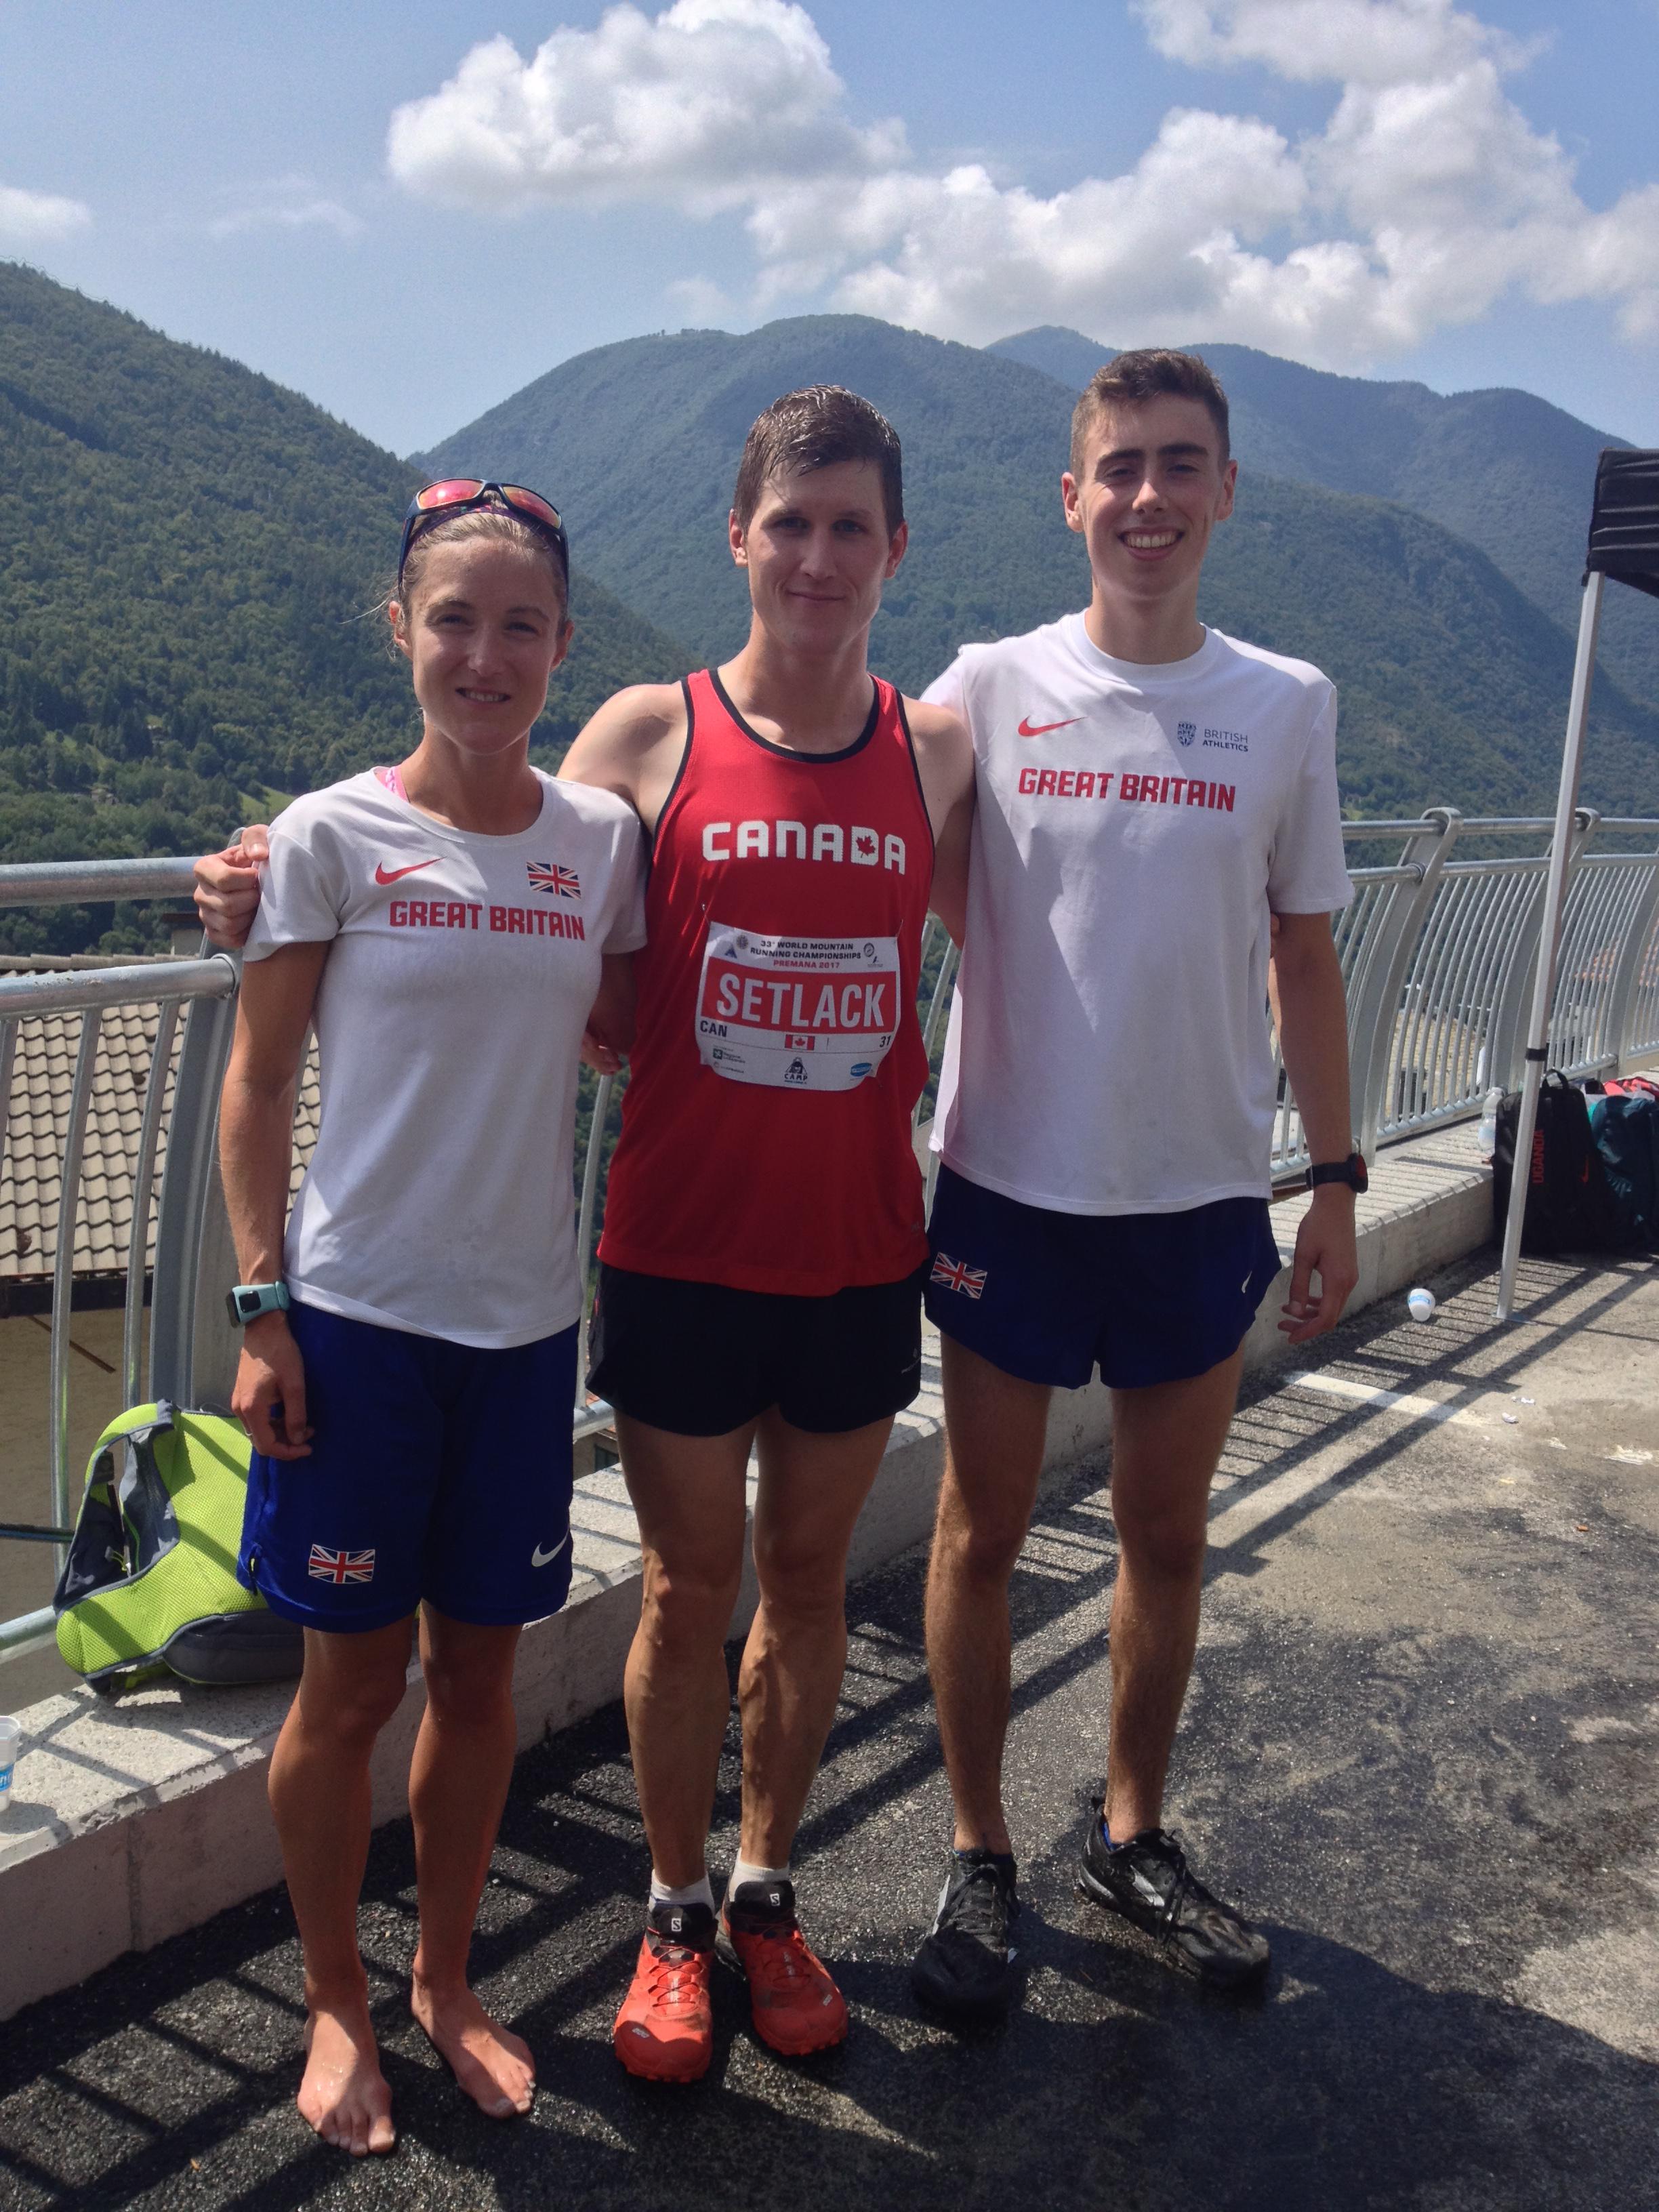 Sarah Tunstall, Matt Setlack and Joe Steward